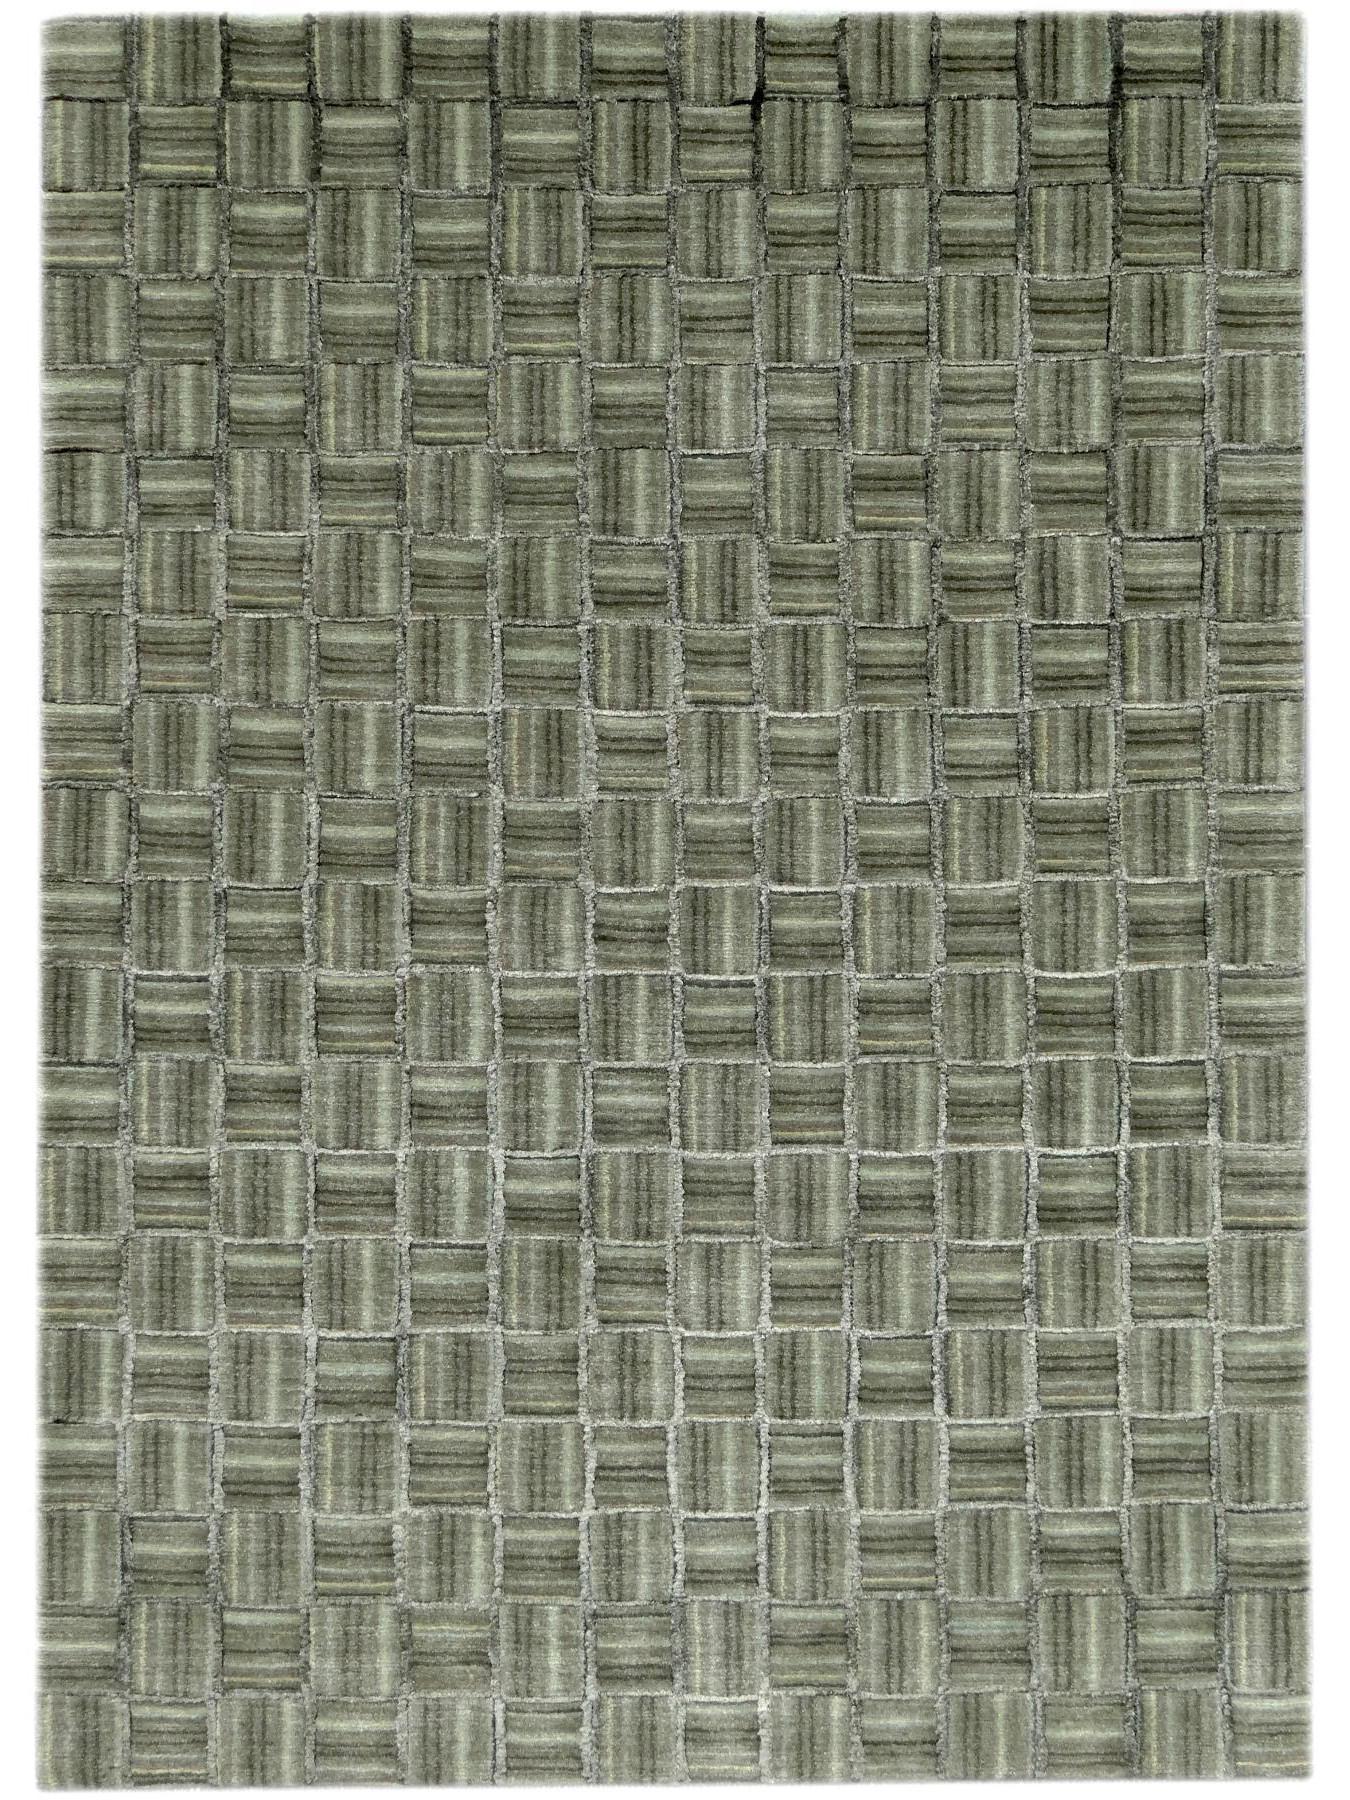 Tapis design - NETA-108 - 4444